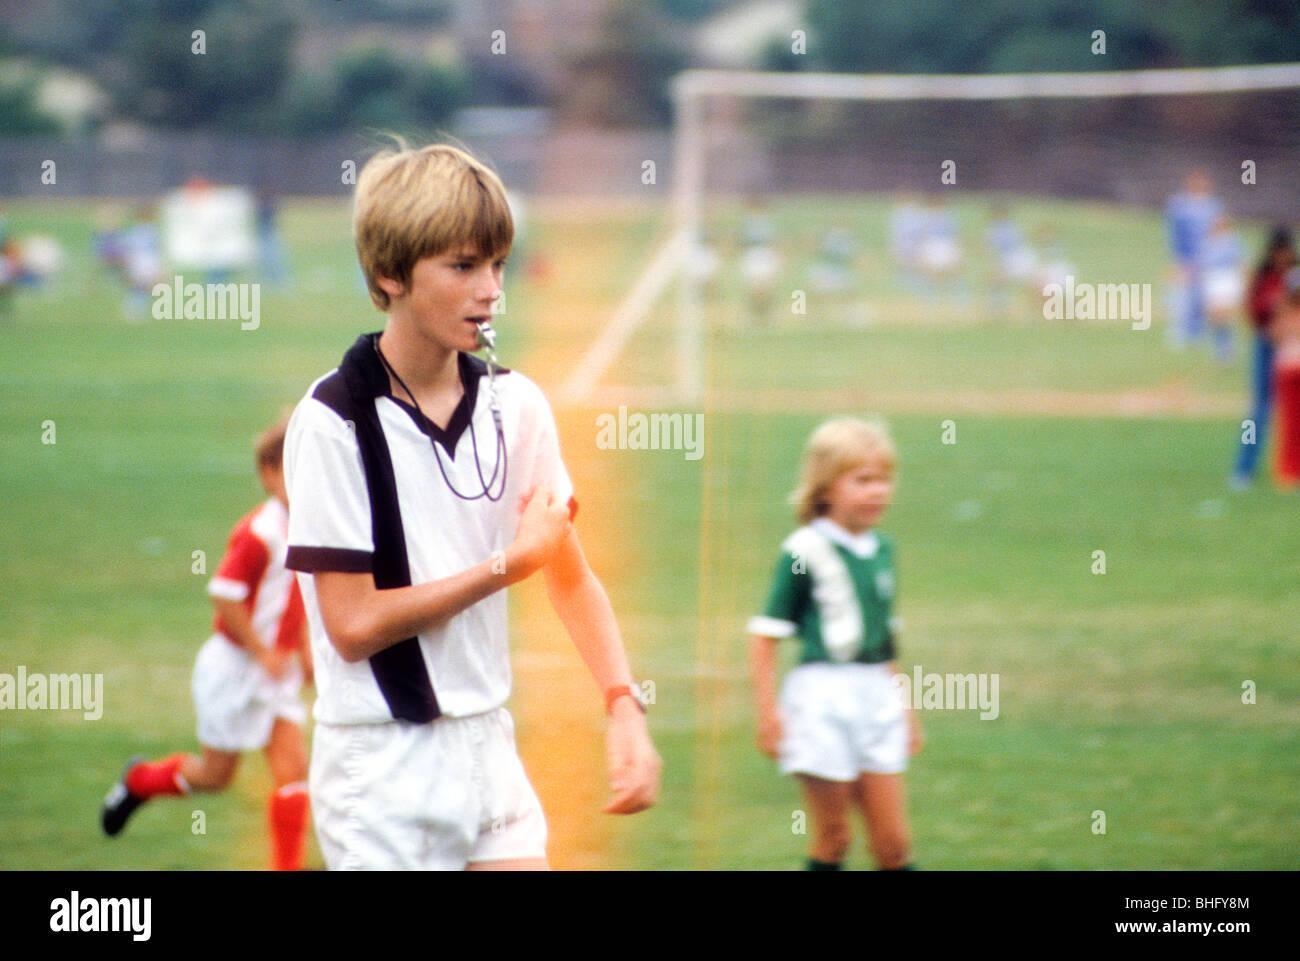 Soccer Teen 5